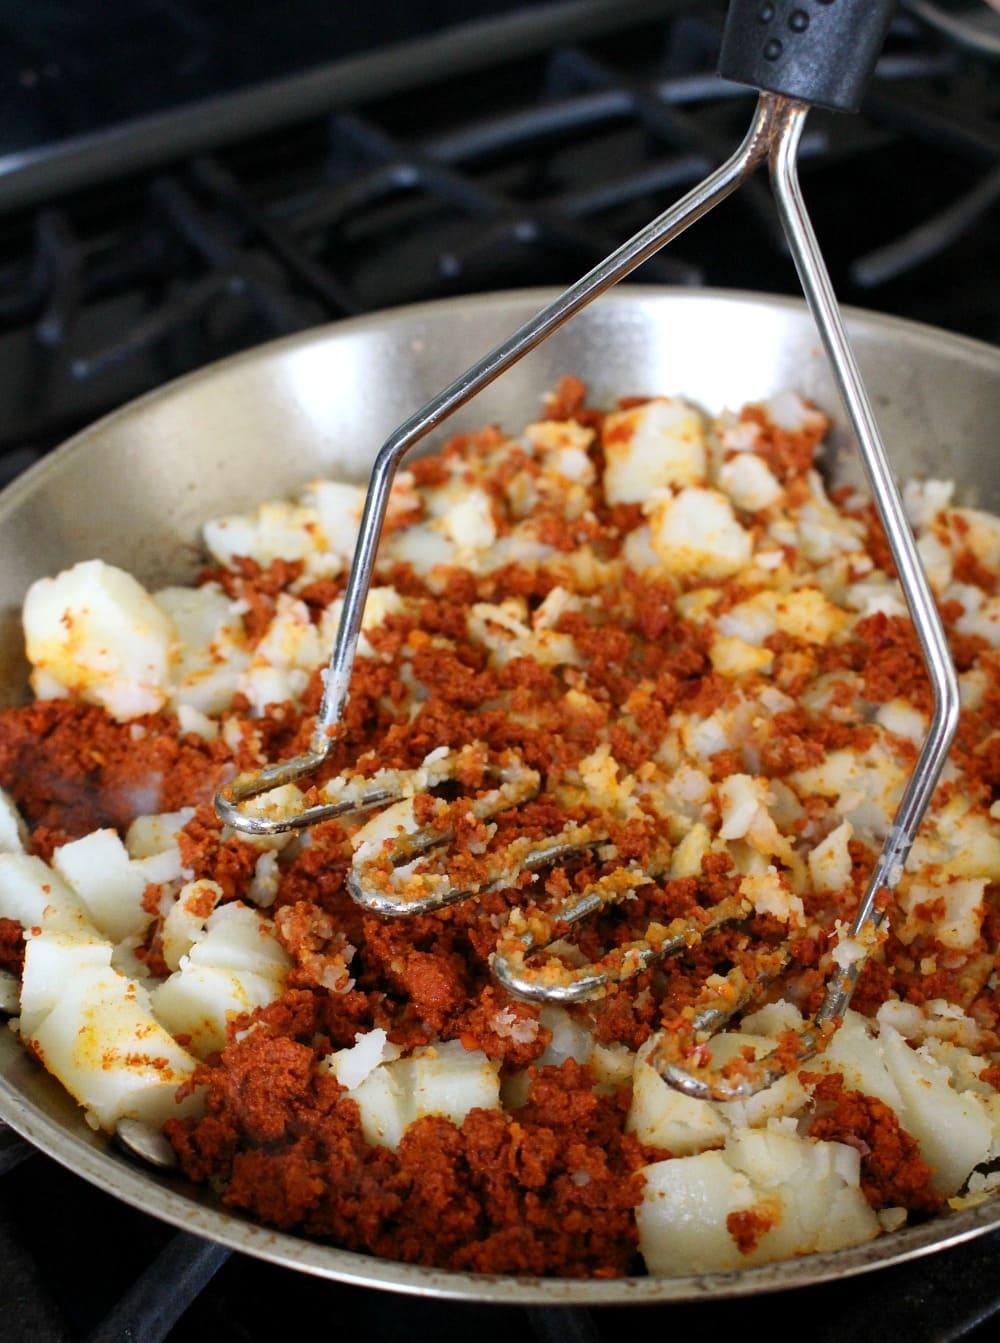 Mashing potatoes and chorizo with a potato masher